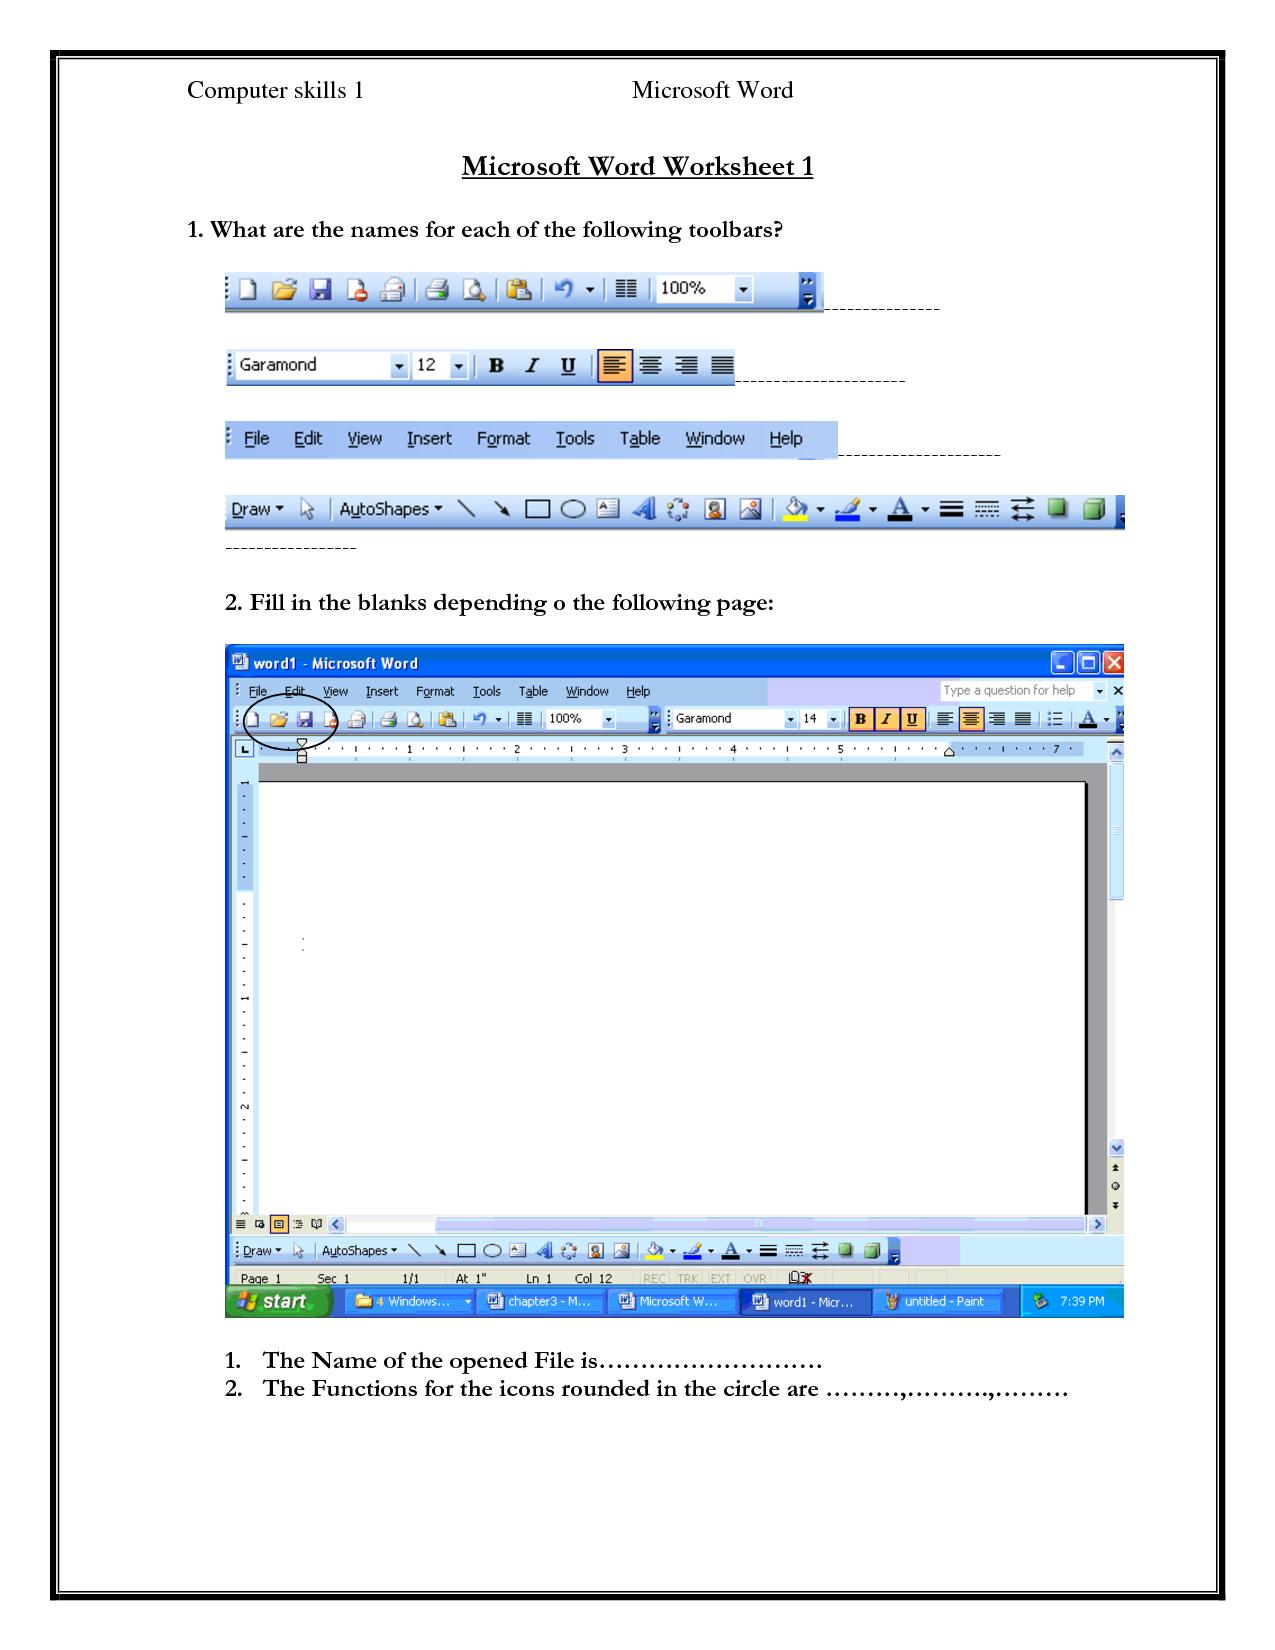 Computer Skills Worksheets | Computer Skills 1 Microsoft Word | Parts Of A Computer Worksheet Printable